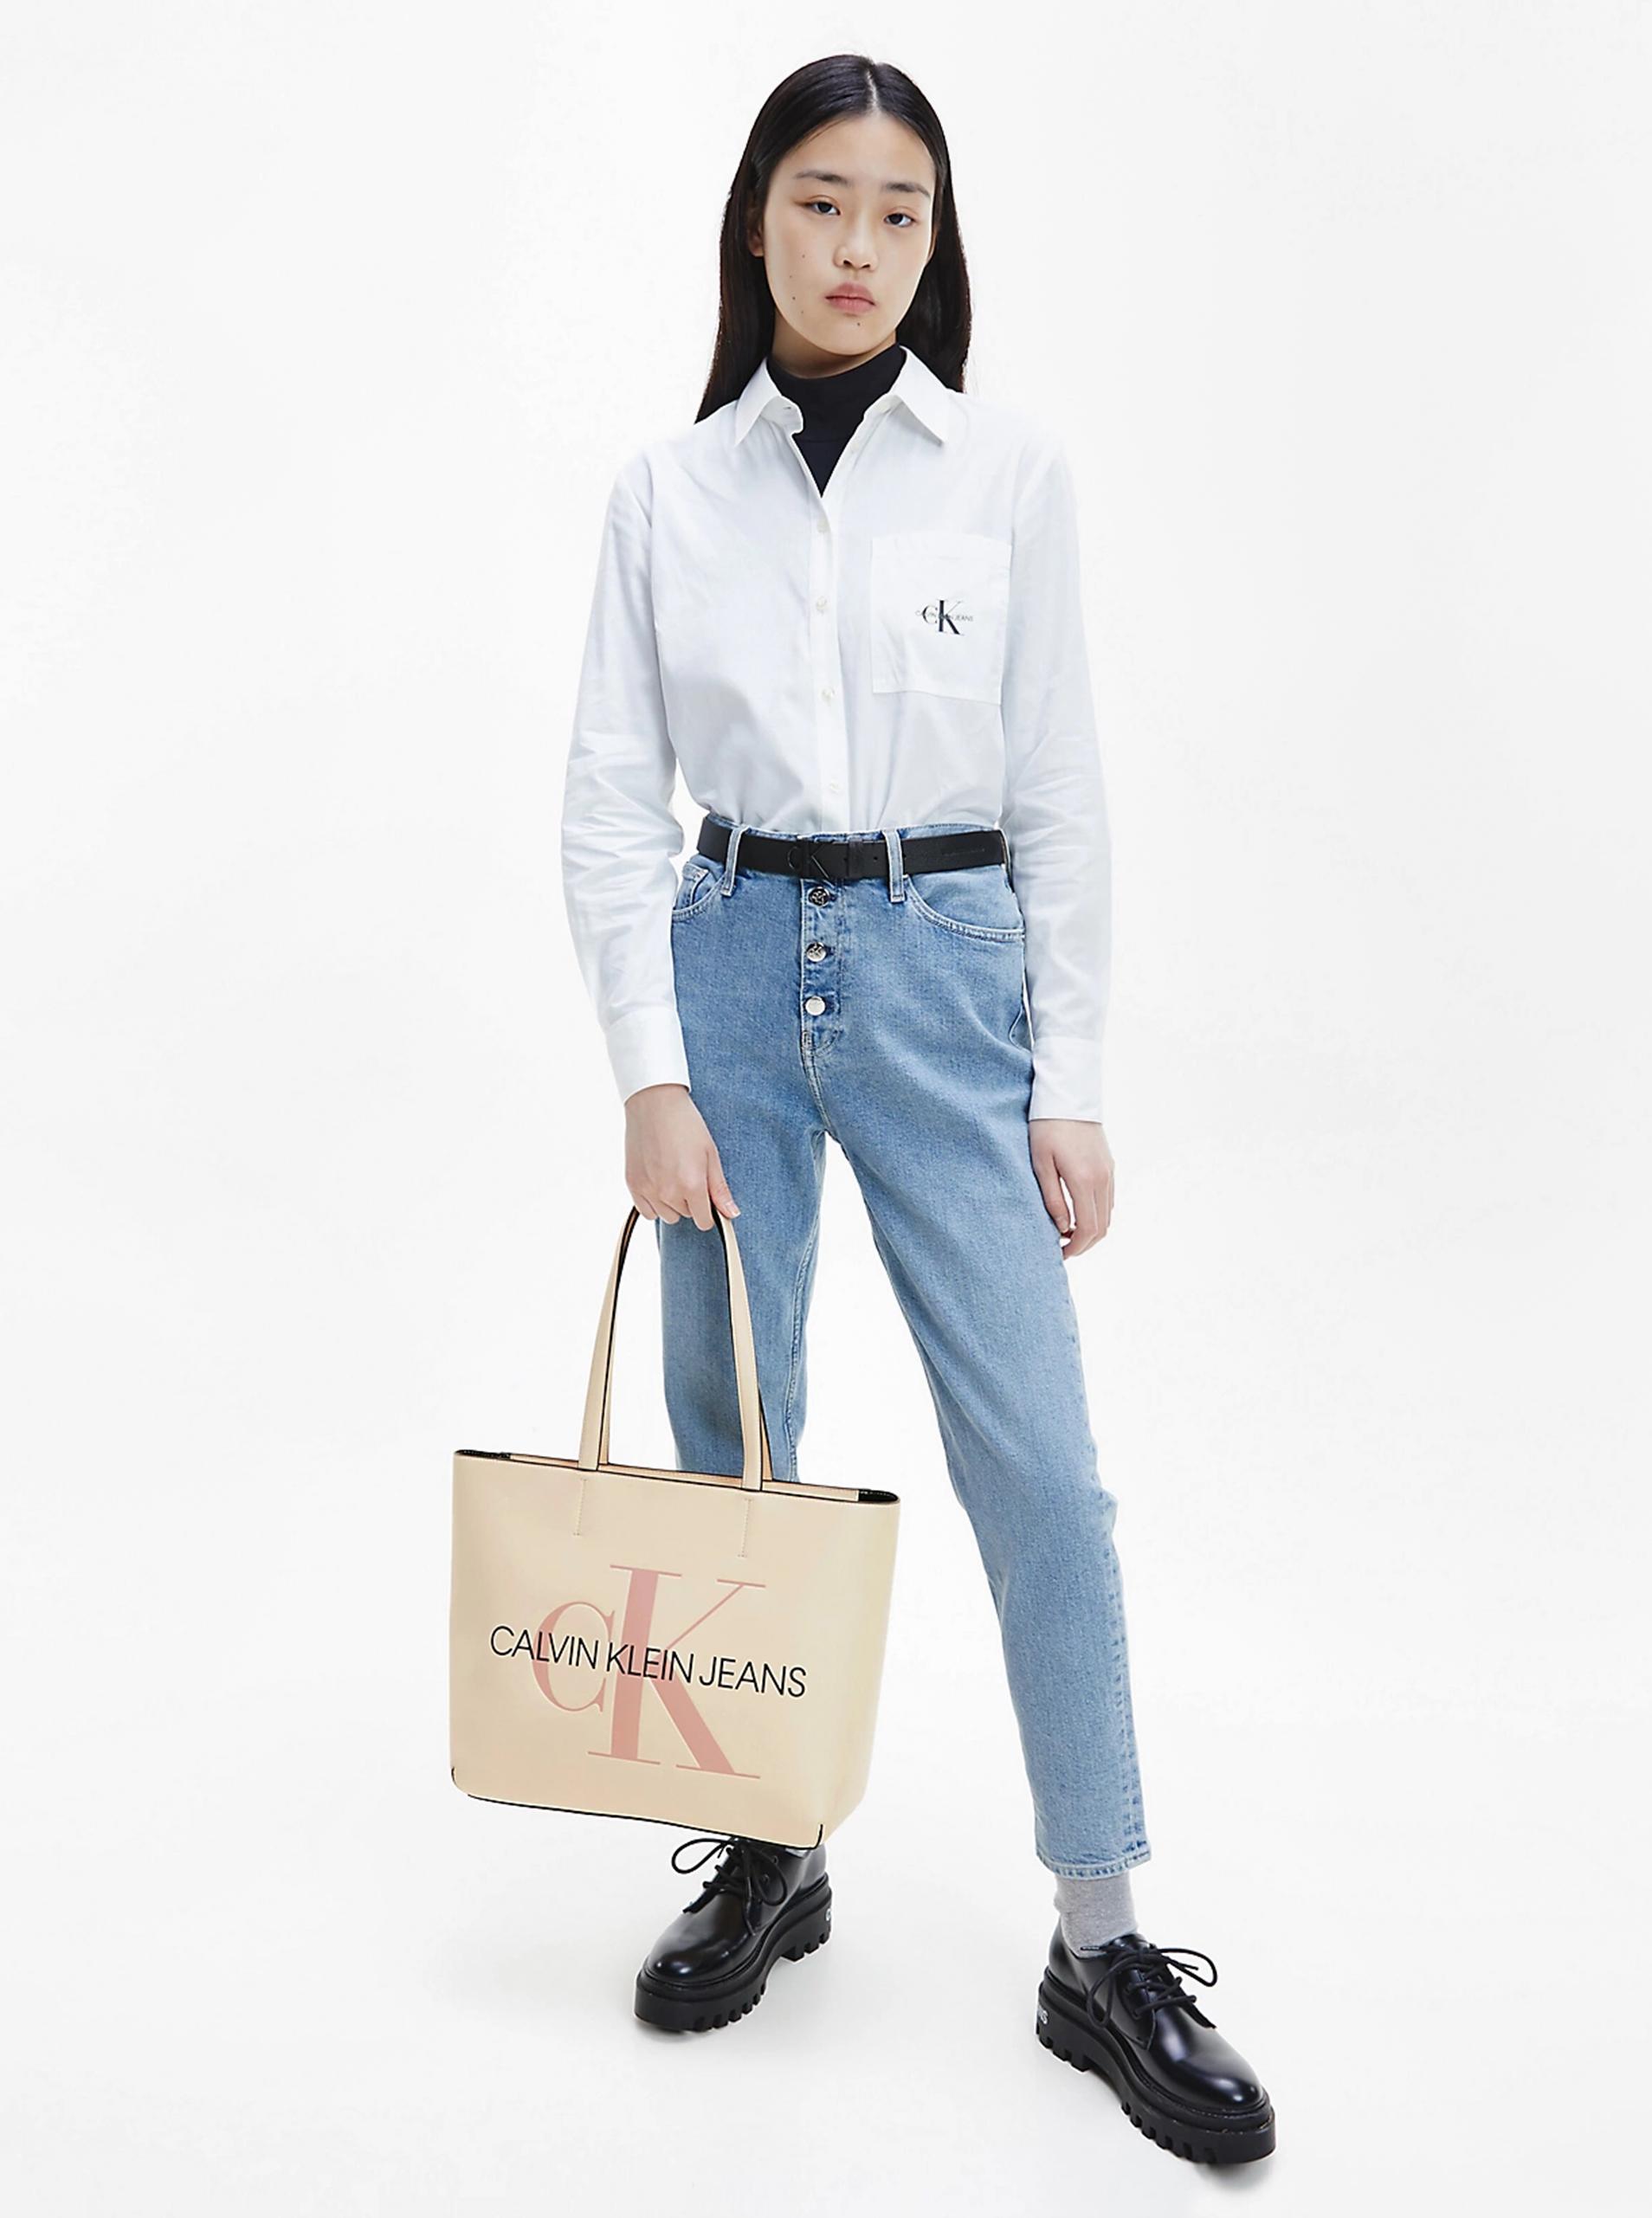 Calvin Klein crema acquirente